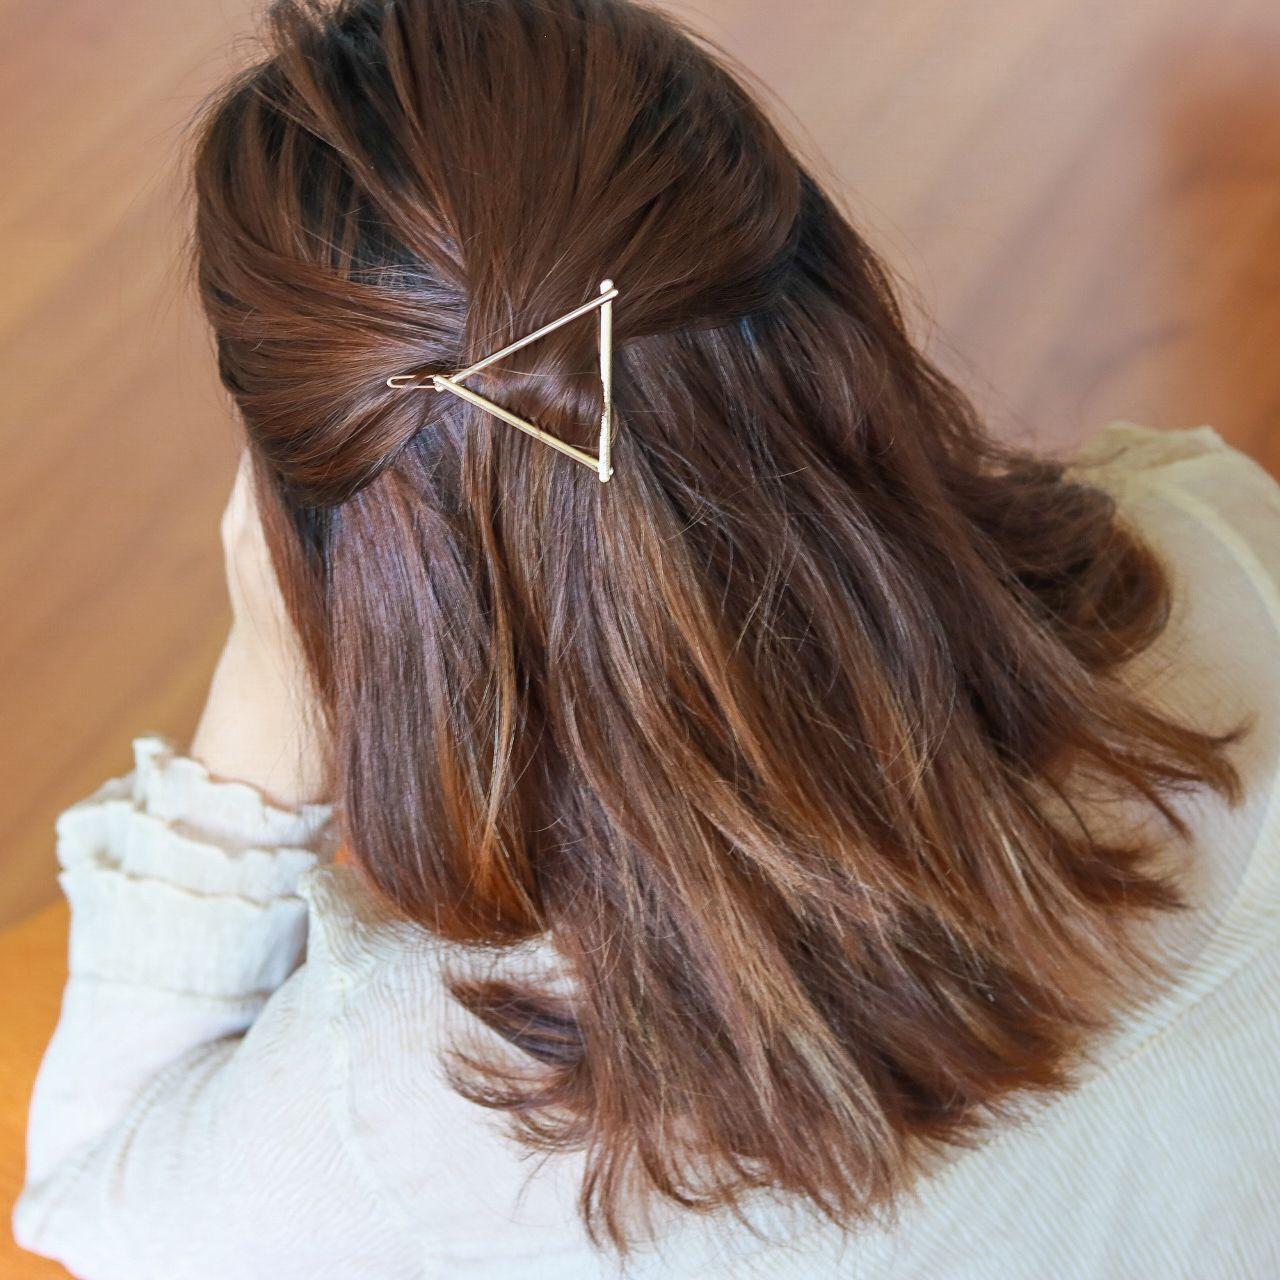 Classic Triangle Hair Clip In Gold Triangle Hair Hair Accessories Curly Hair Styles